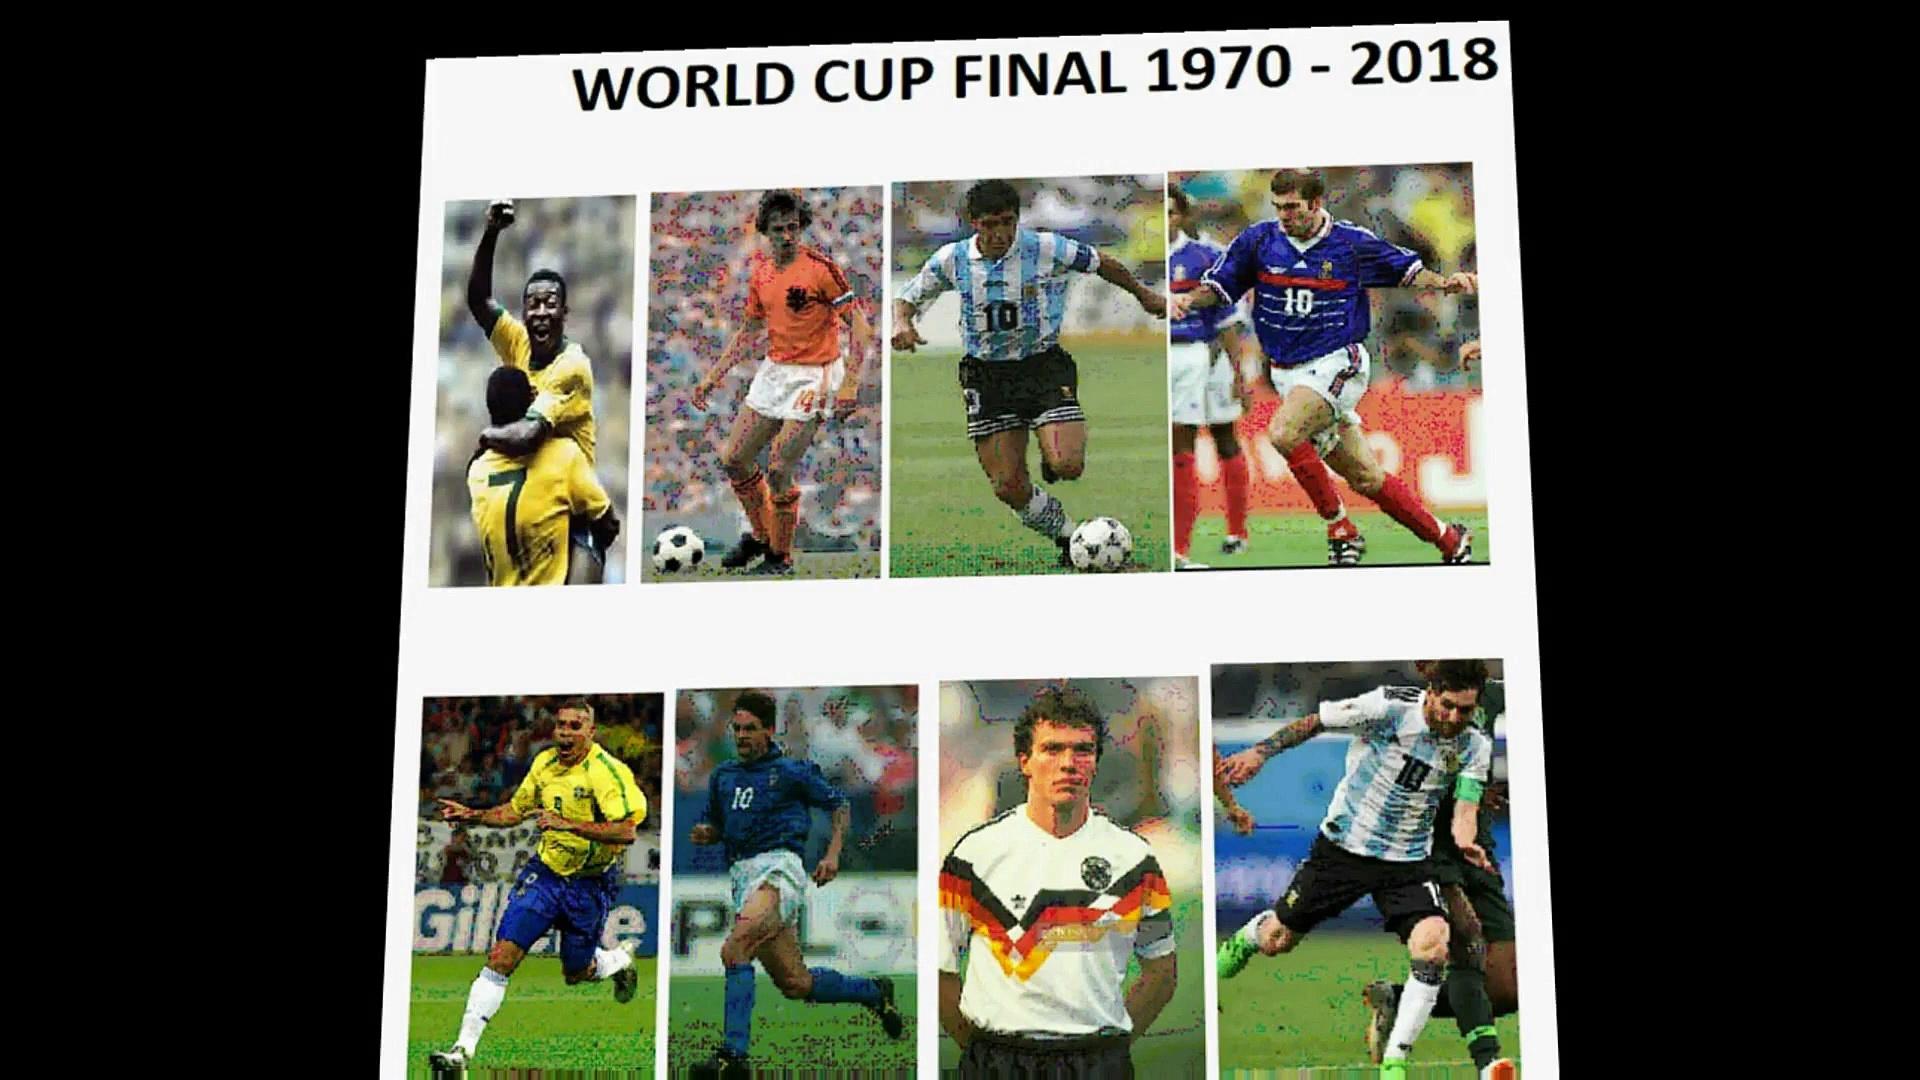 world cup Finals 1970 – 2018